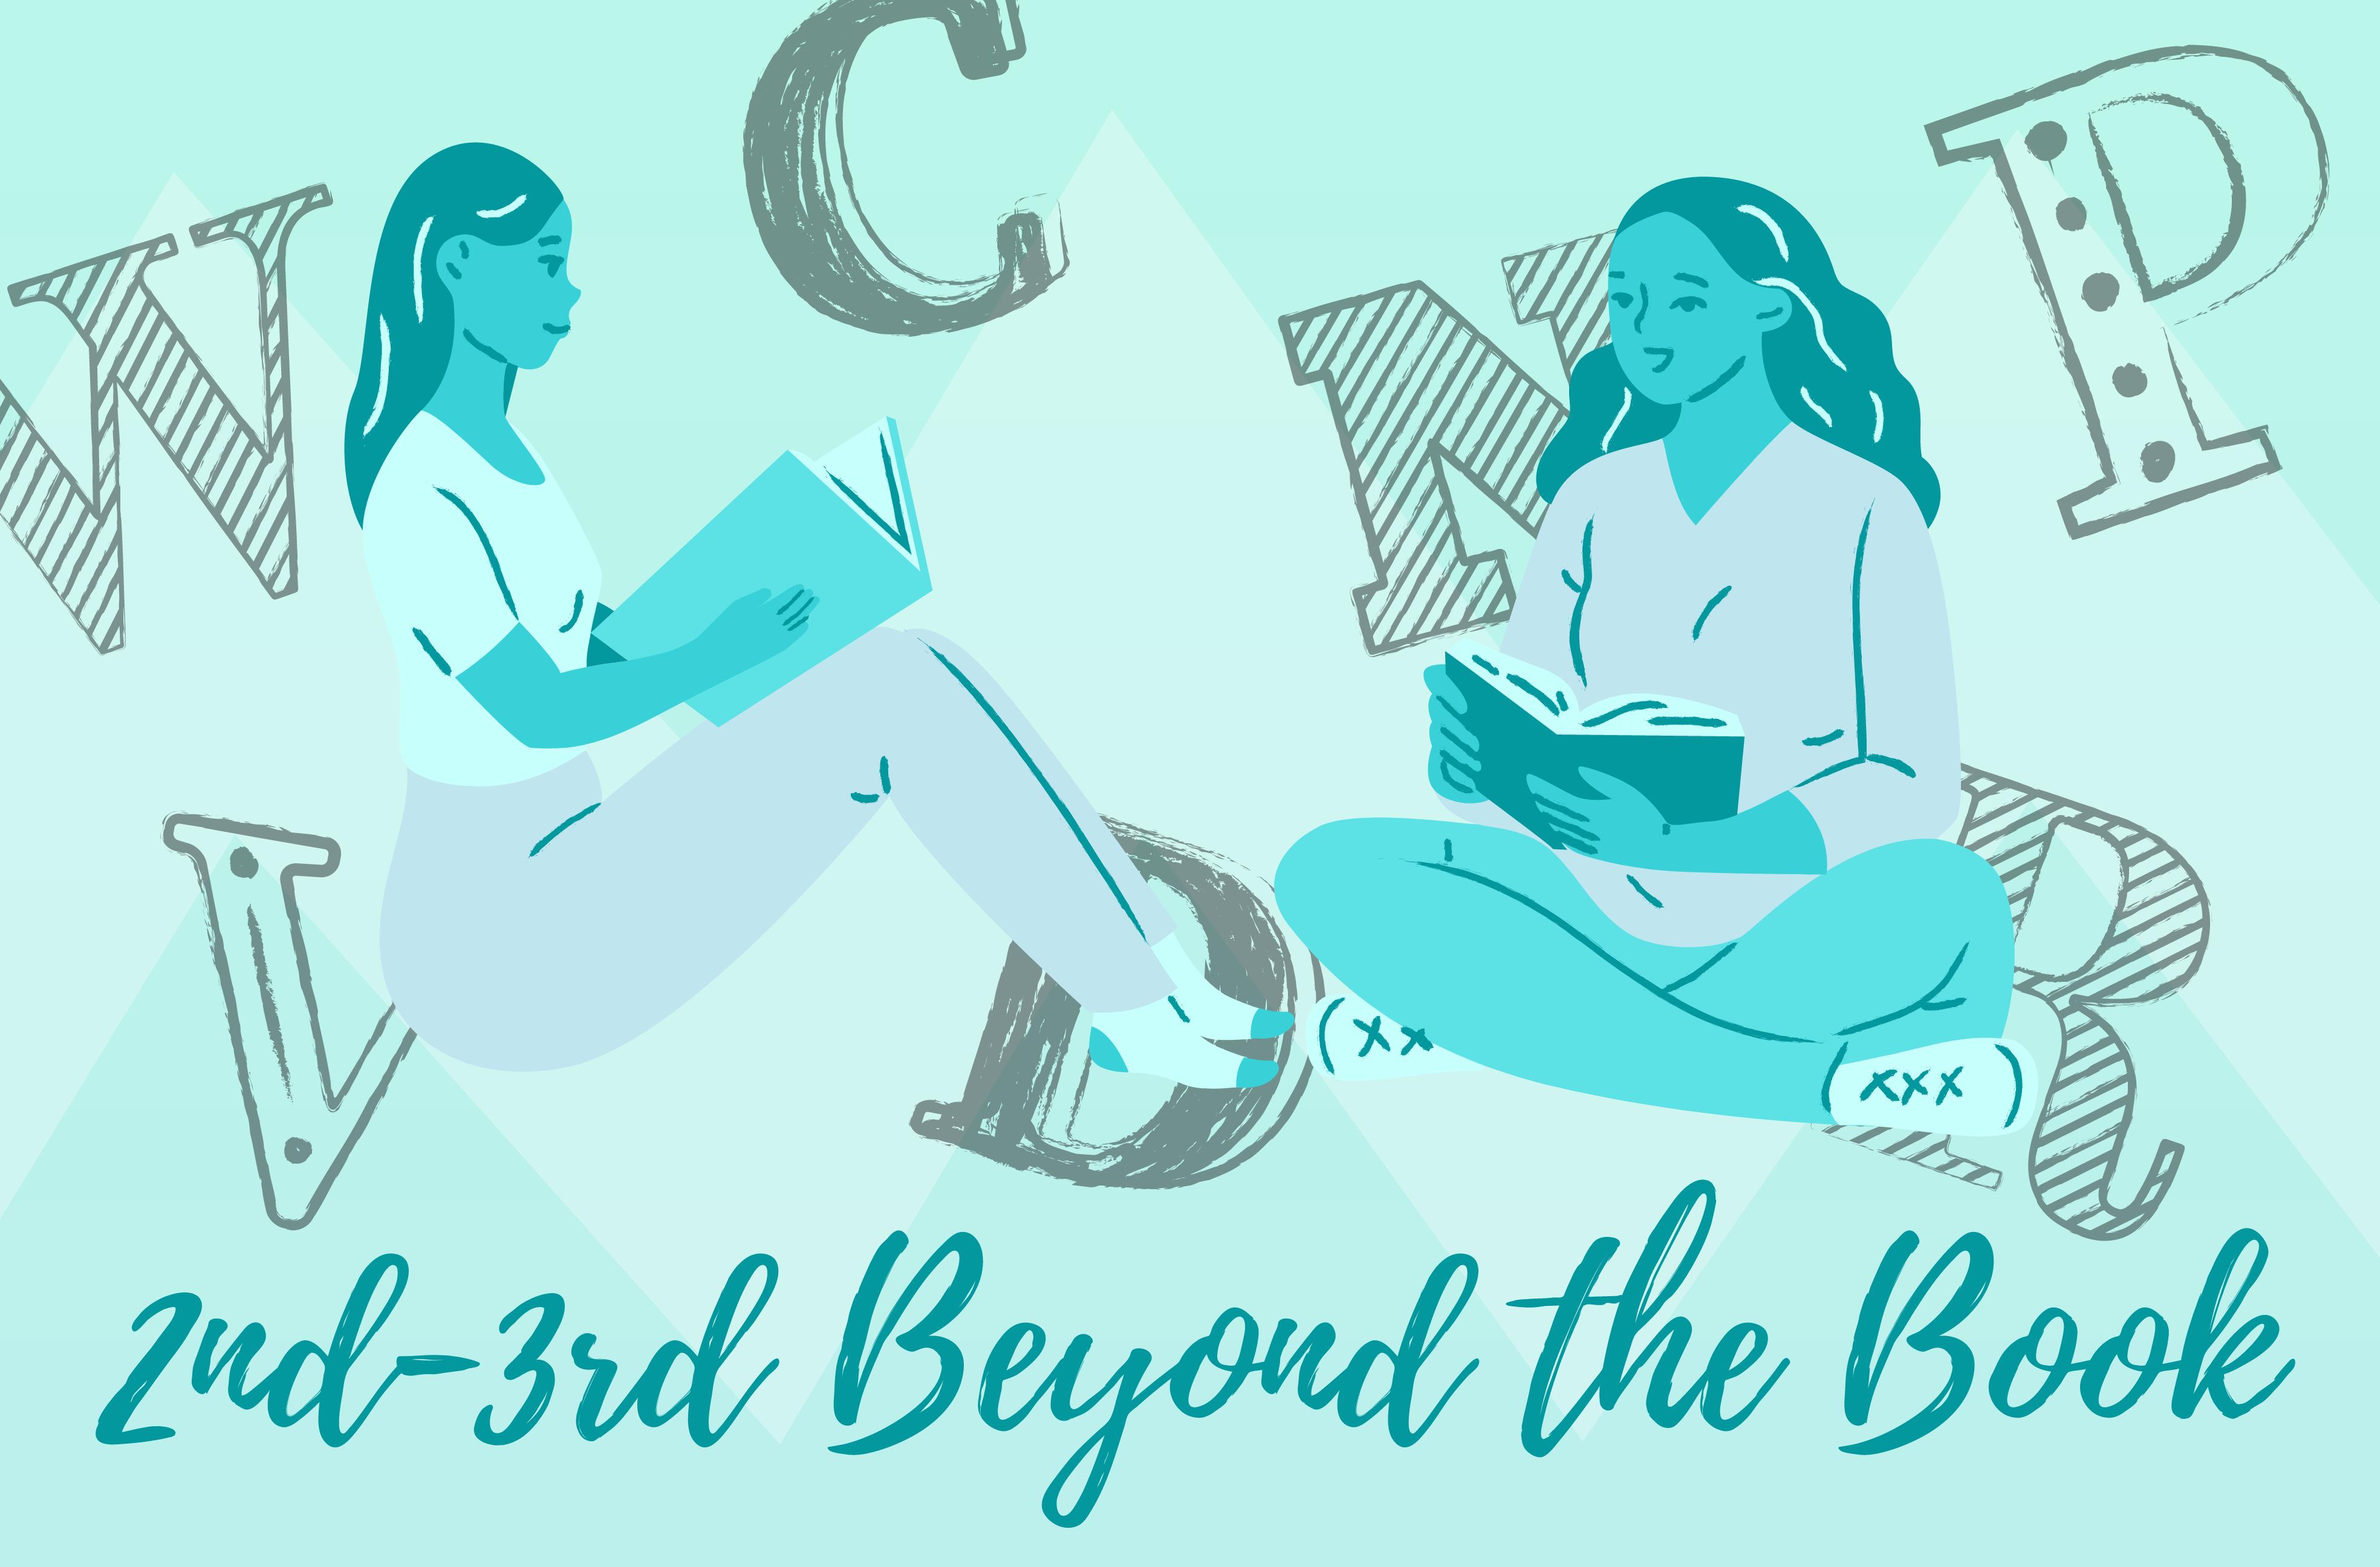 2nd-3rd Grade Beyond the Book